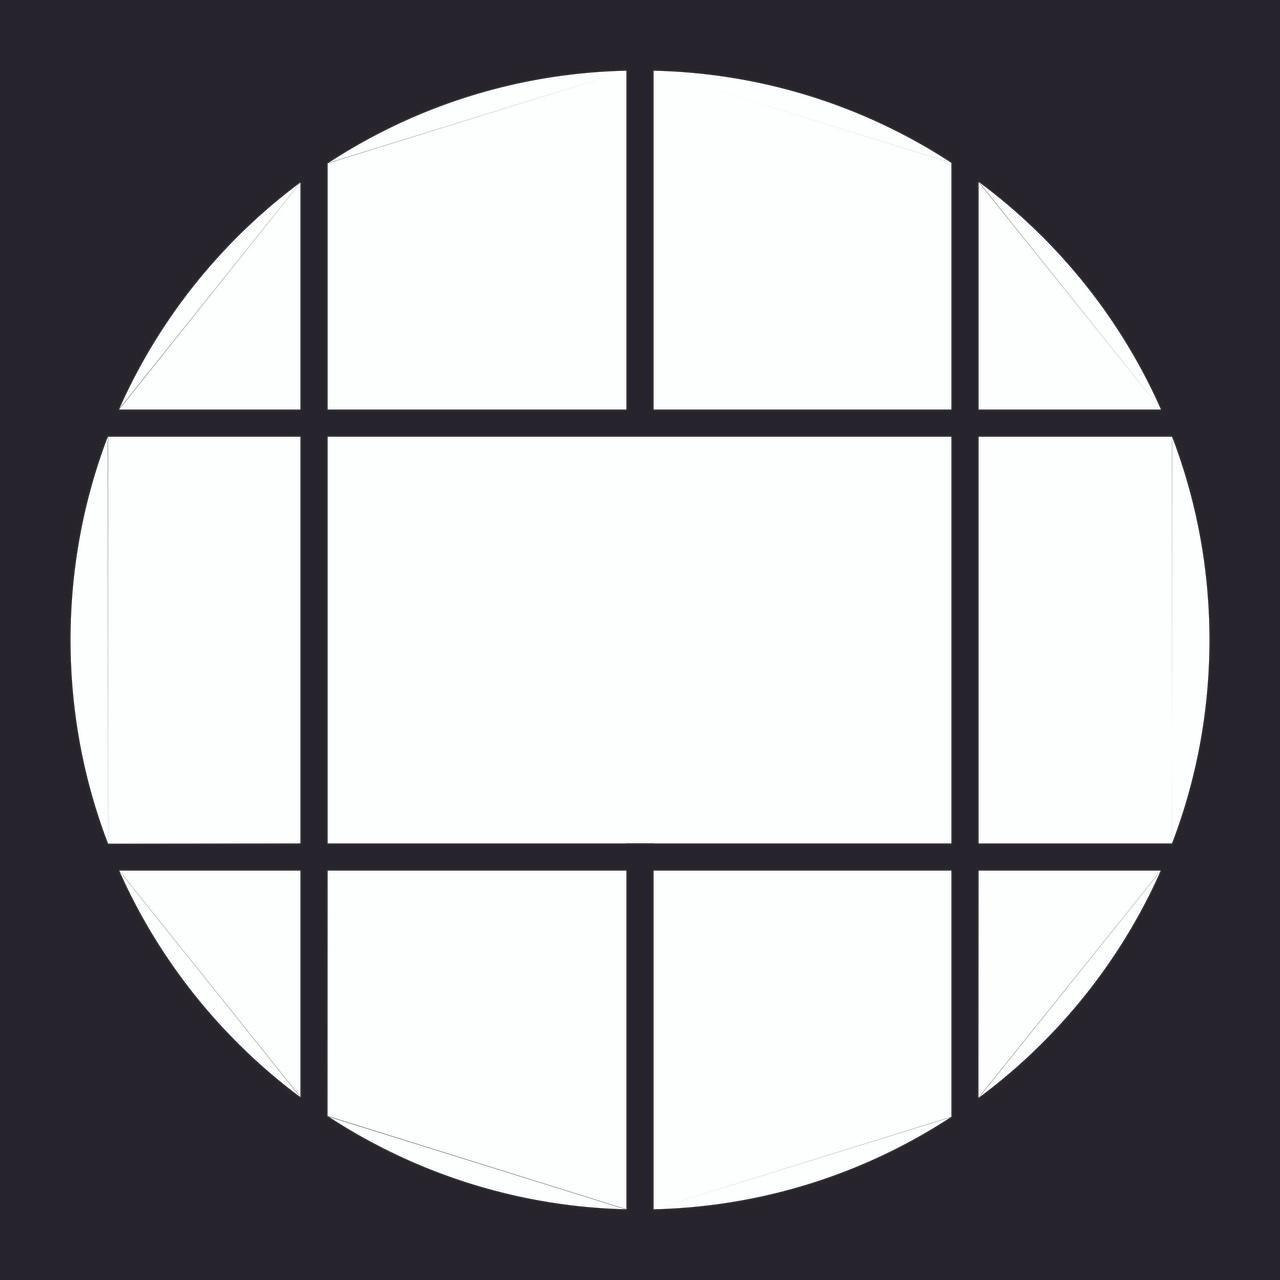 circle 12x12 overlay want2scrap